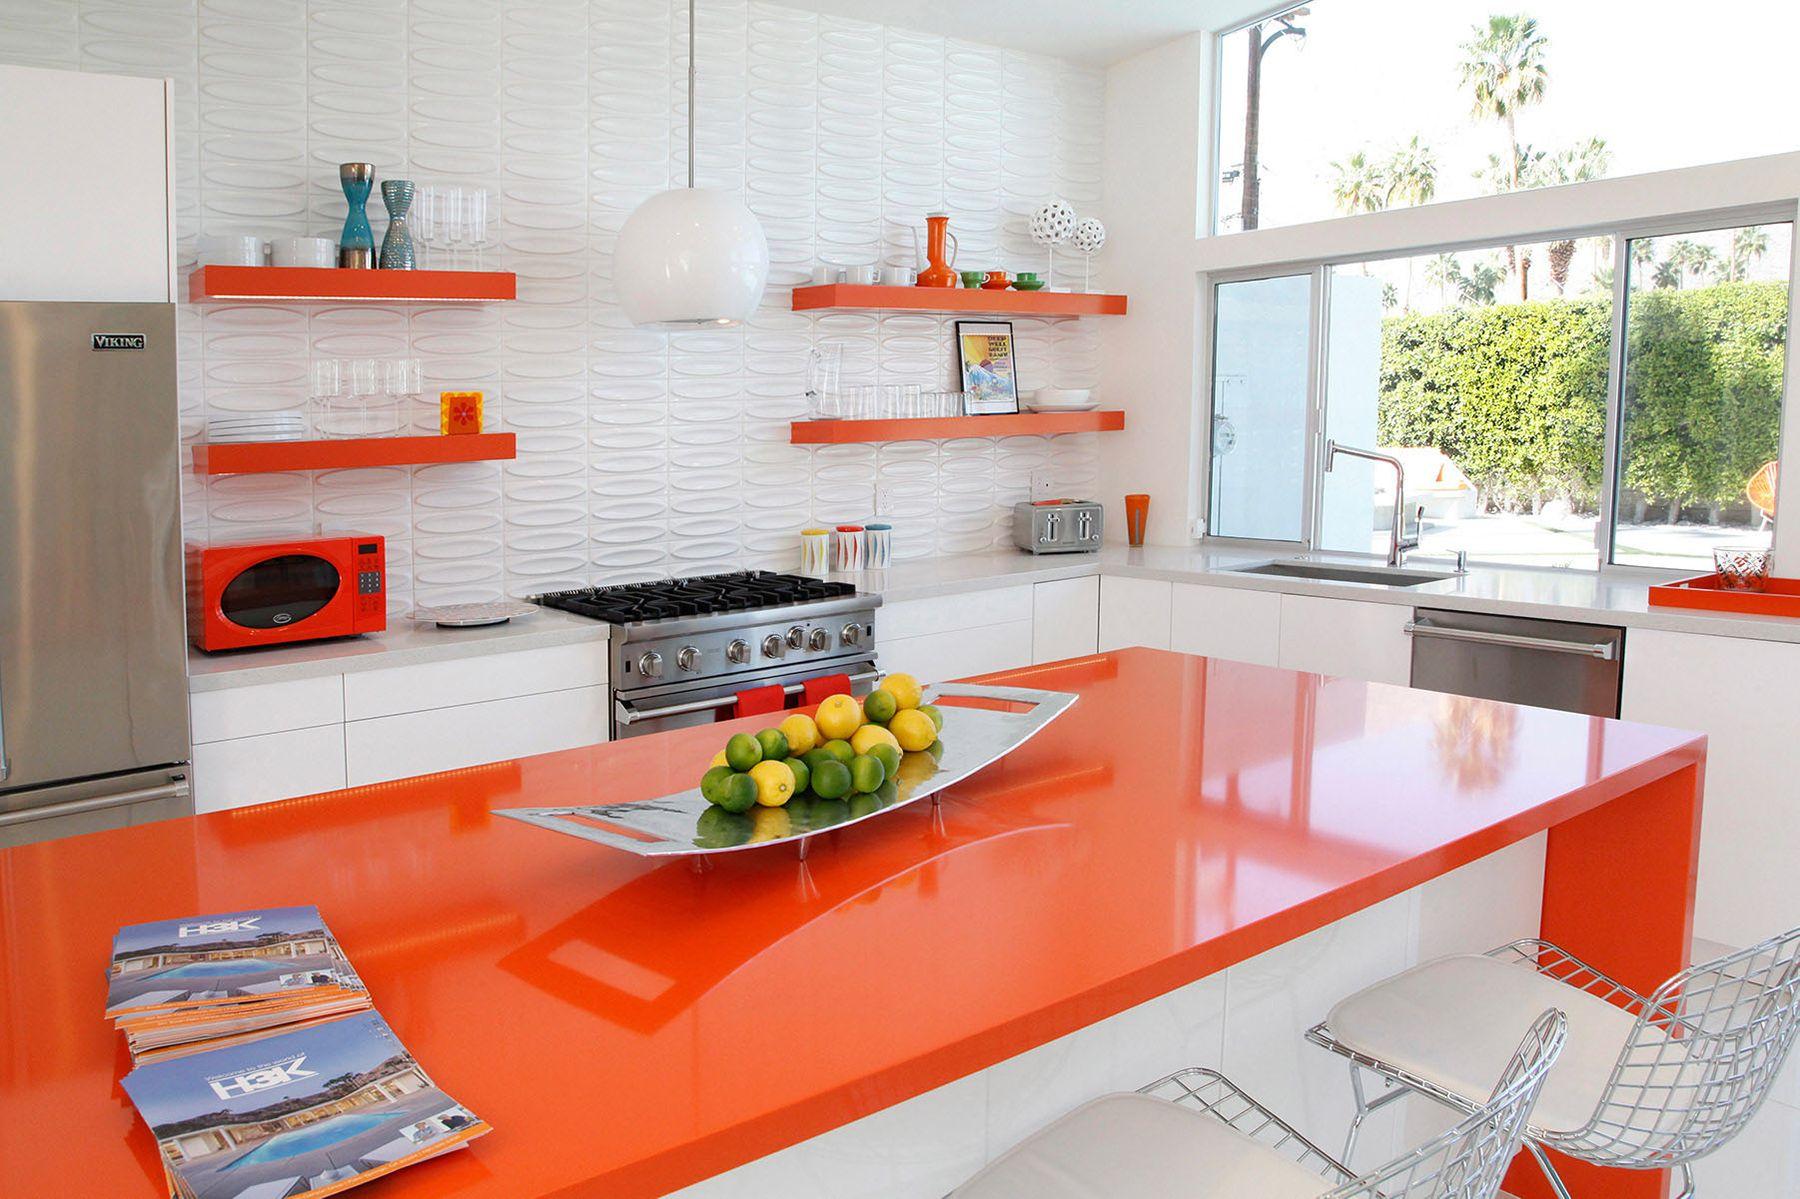 Kitchens & Dining 15.jpg